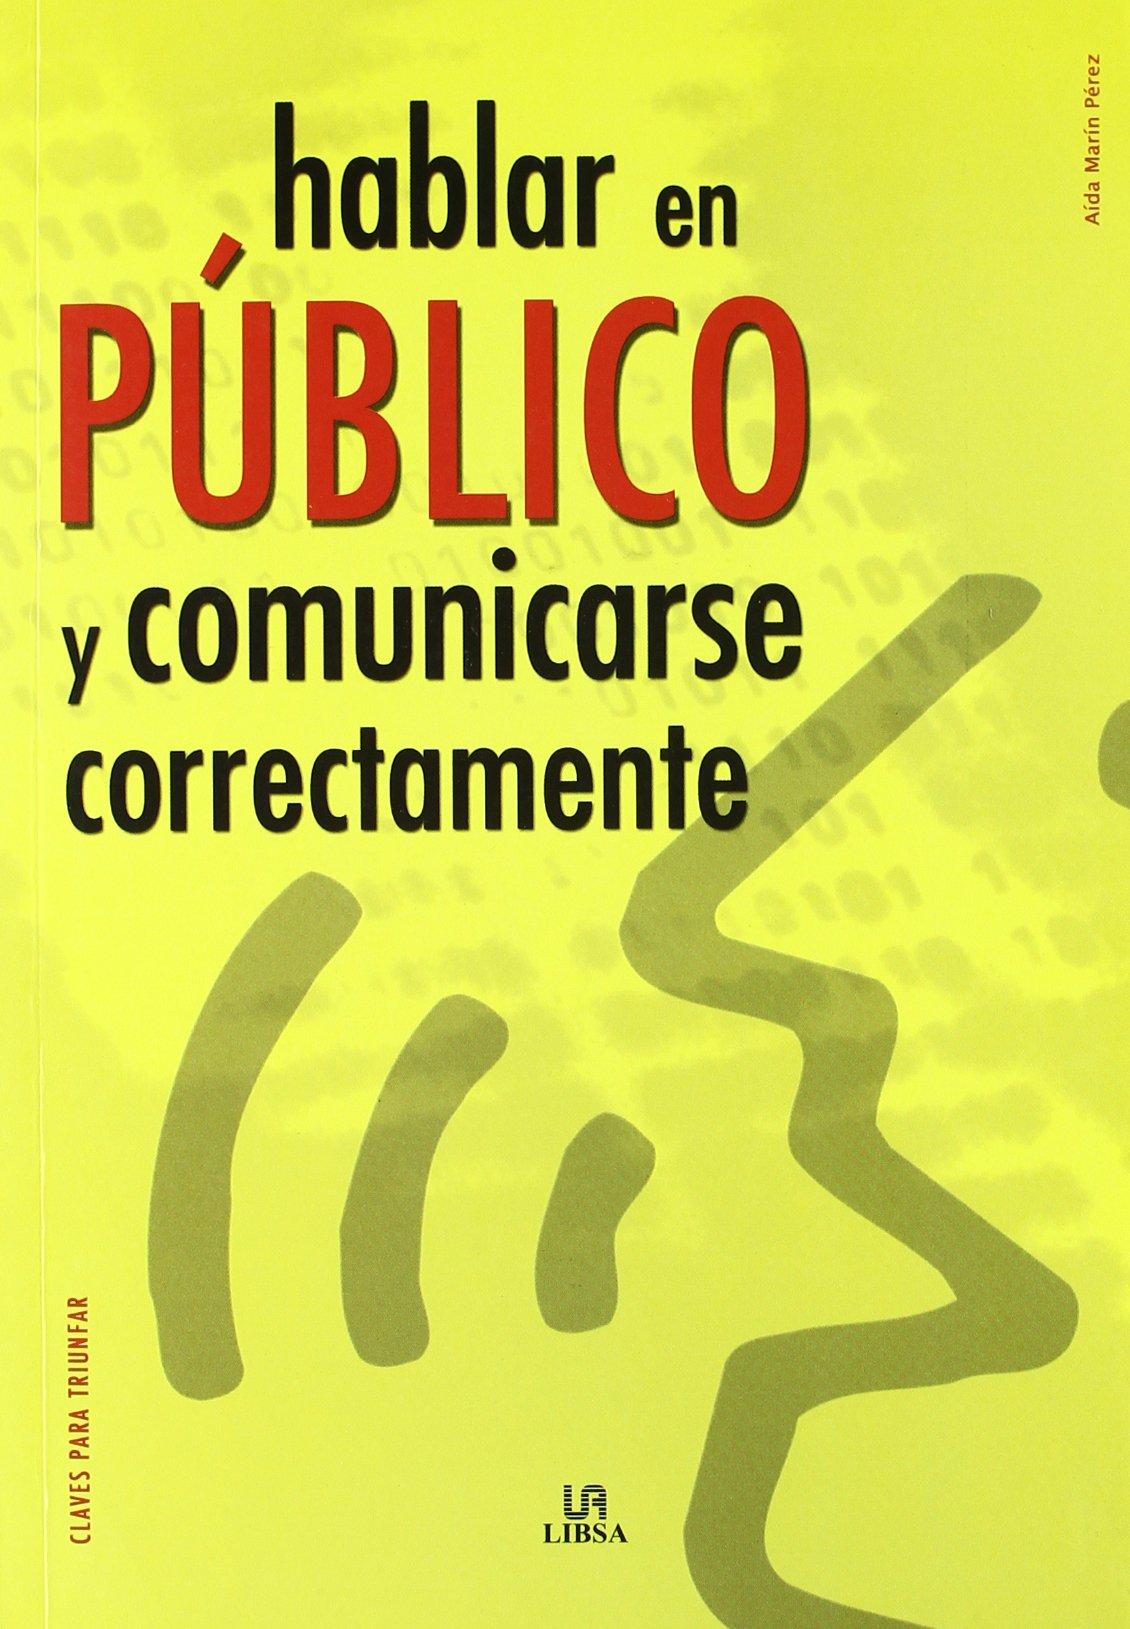 Download Hablar en publico y comunicarse correctamente/ Public Speaking and Communicating Correctly (Claves para triunfar/ Keys to Success) (Spanish Edition) PDF